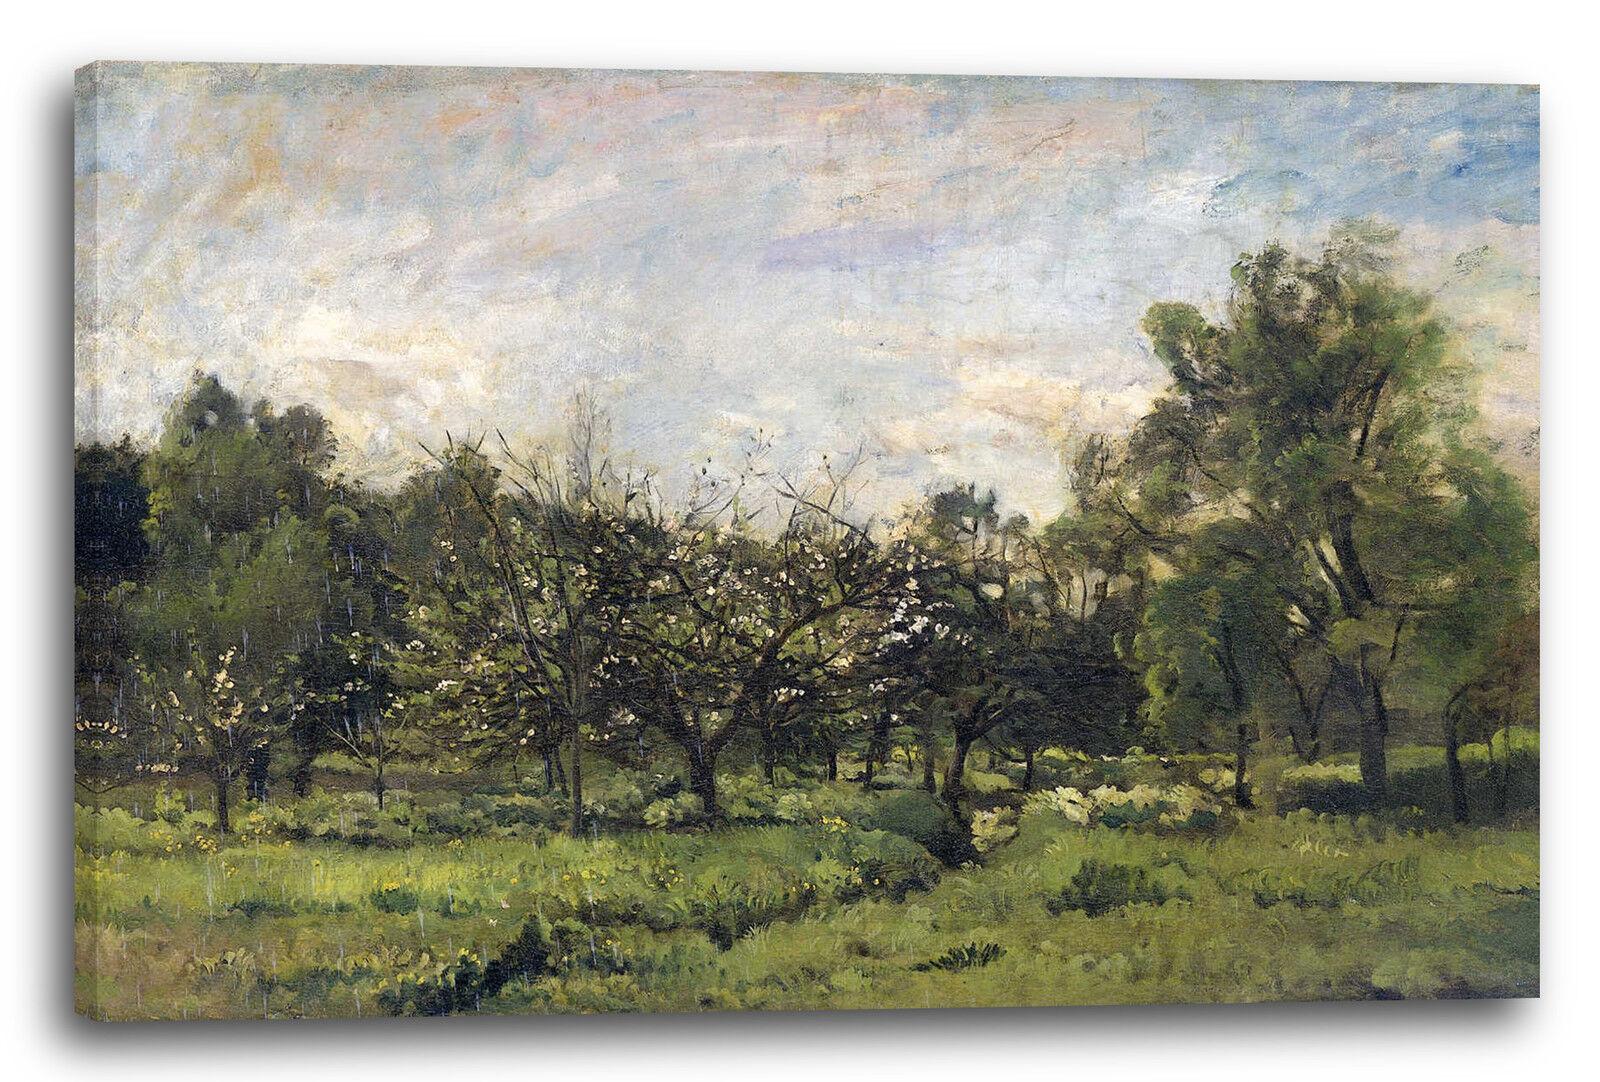 Lein-Wand-Bild Kunstdruck  Charles Francois Daubigny Orchard 1869